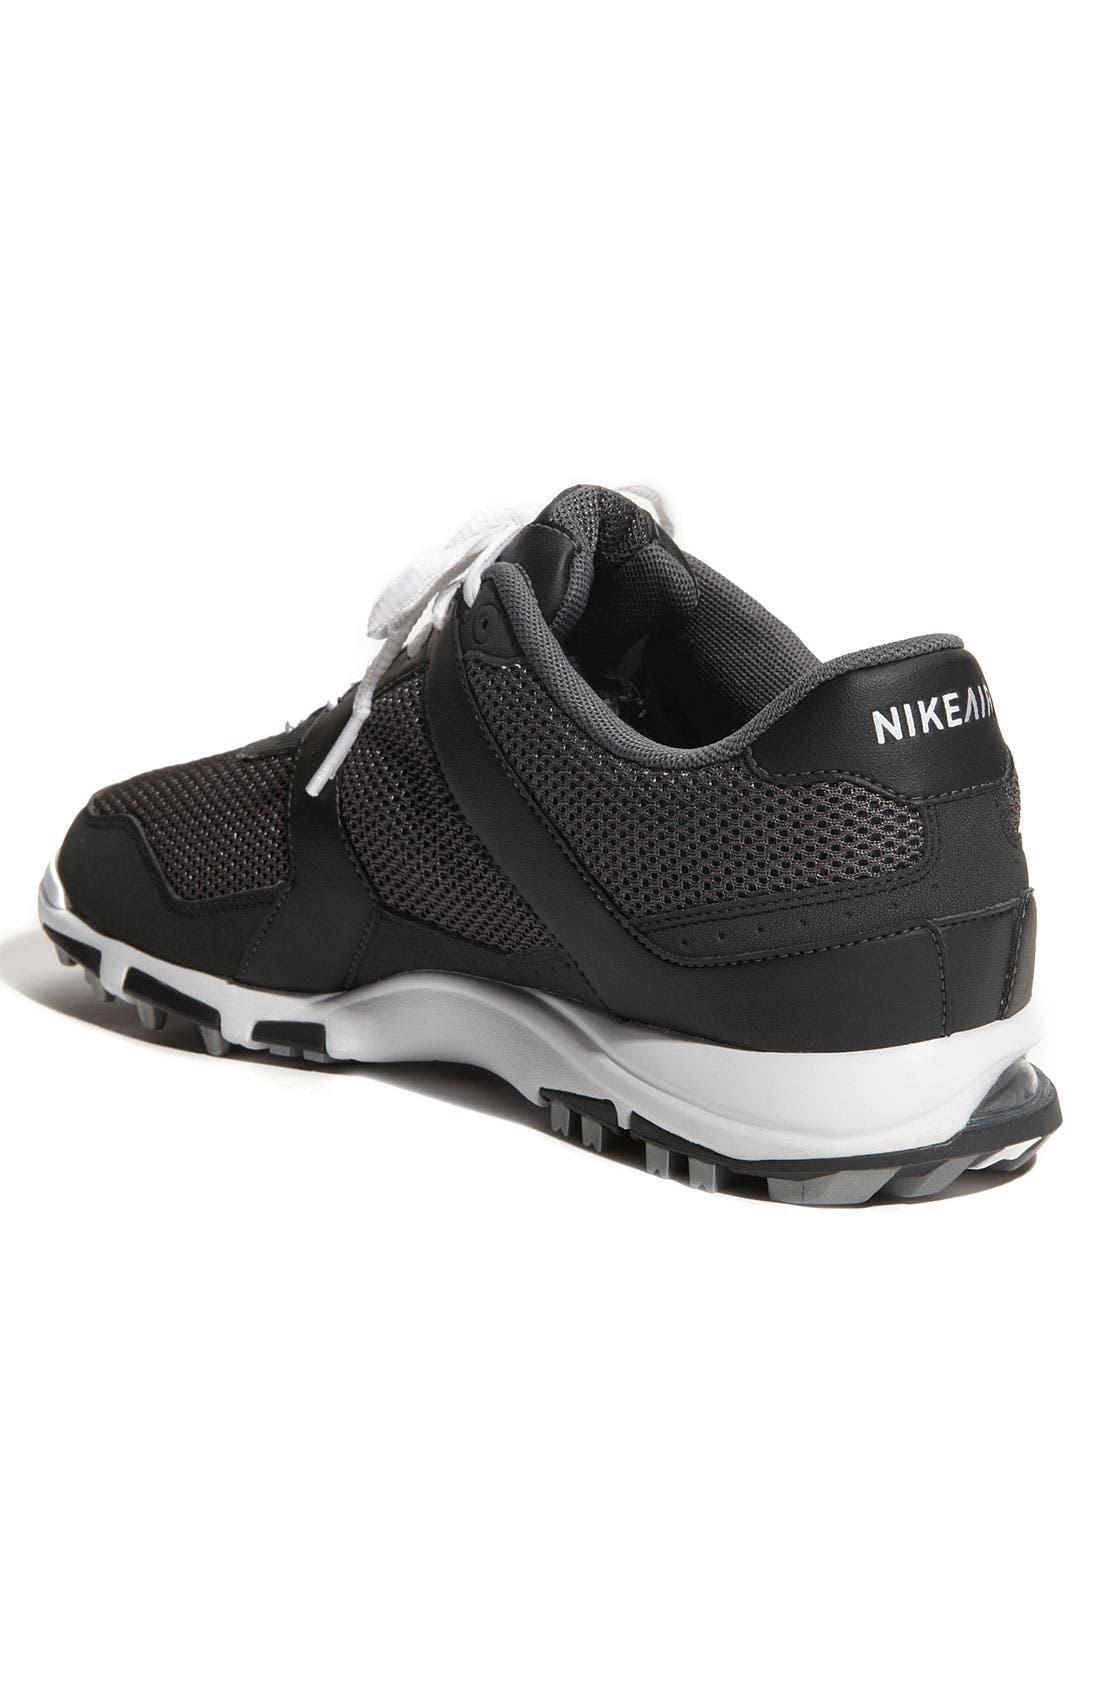 Alternate Image 2  - Nike 'Air Range WP' Golf Shoe (Men)